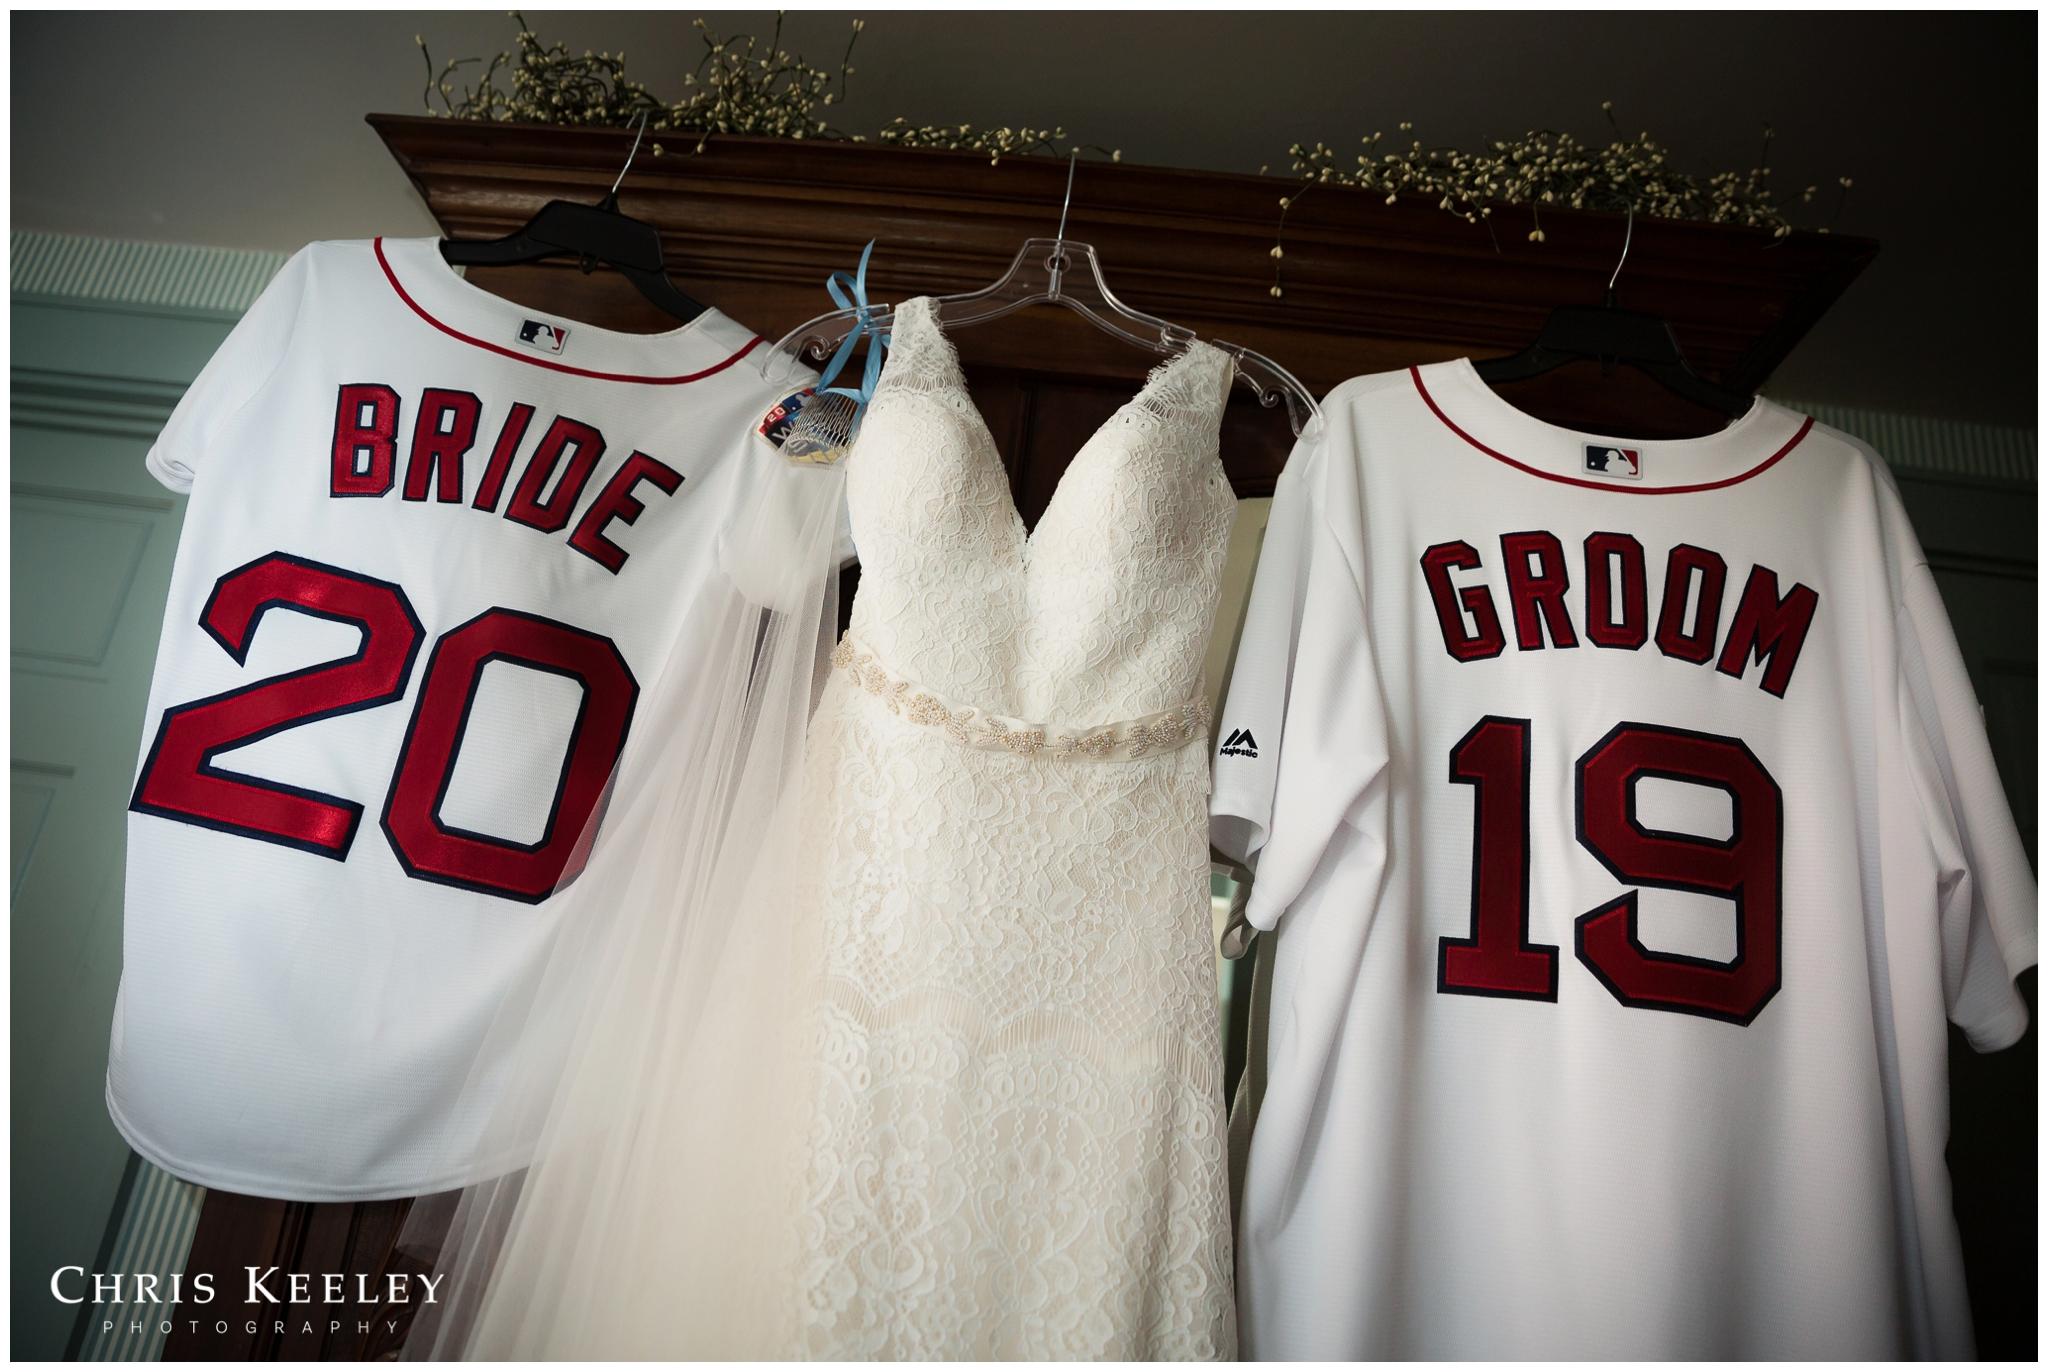 wedding-dress-with-red-sox-custom-bride-groom-jerseys.jpg